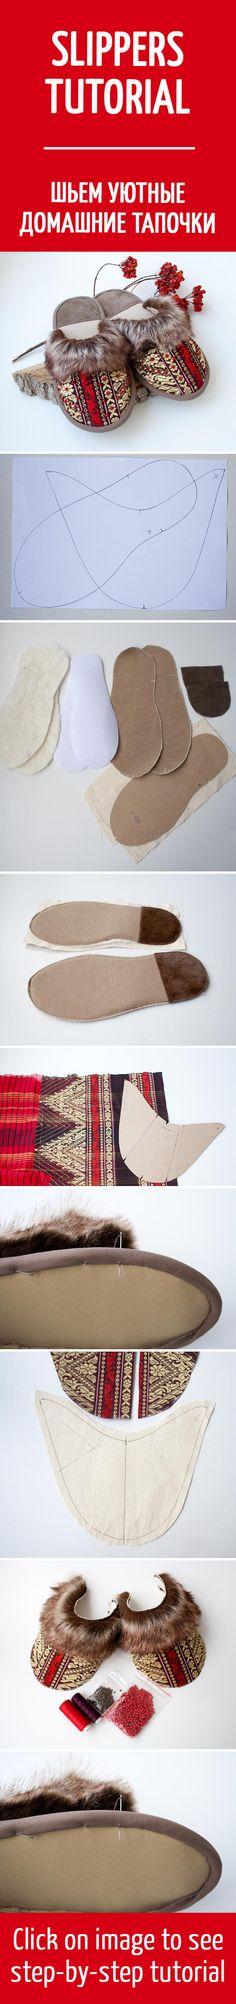 Шьем уютные домашние тапочки «Сударушка» / How to sew slippers tutorial